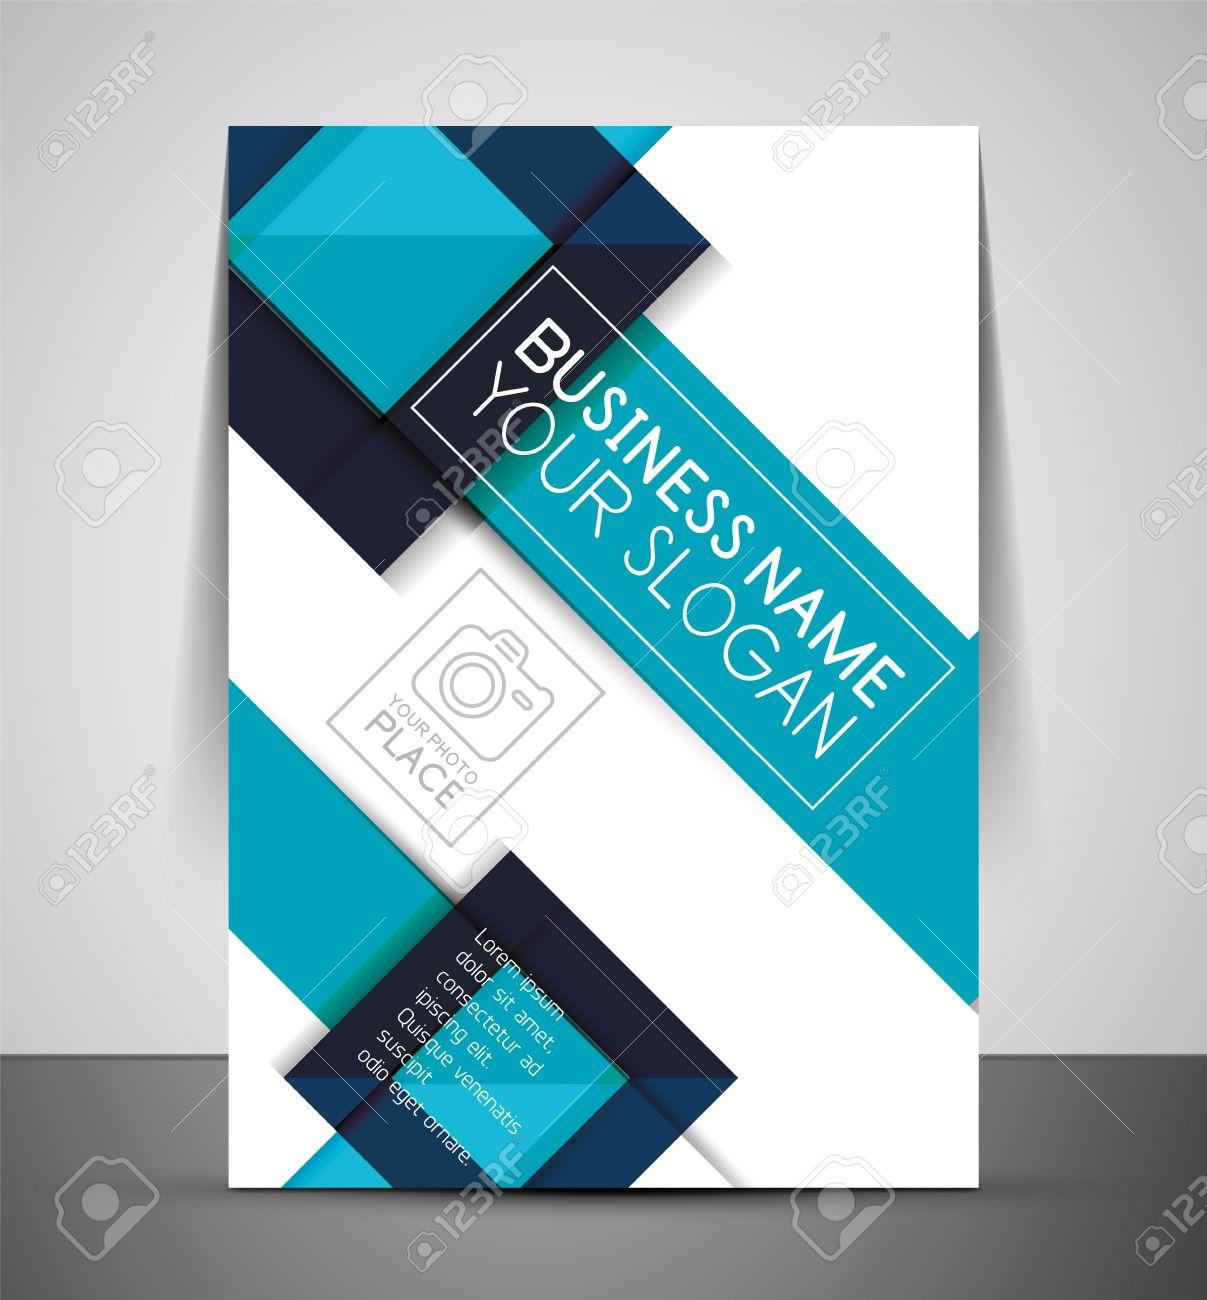 cmyk business corporate flyer template geometrical design cmyk business corporate flyer template geometrical design stock vector 27206916